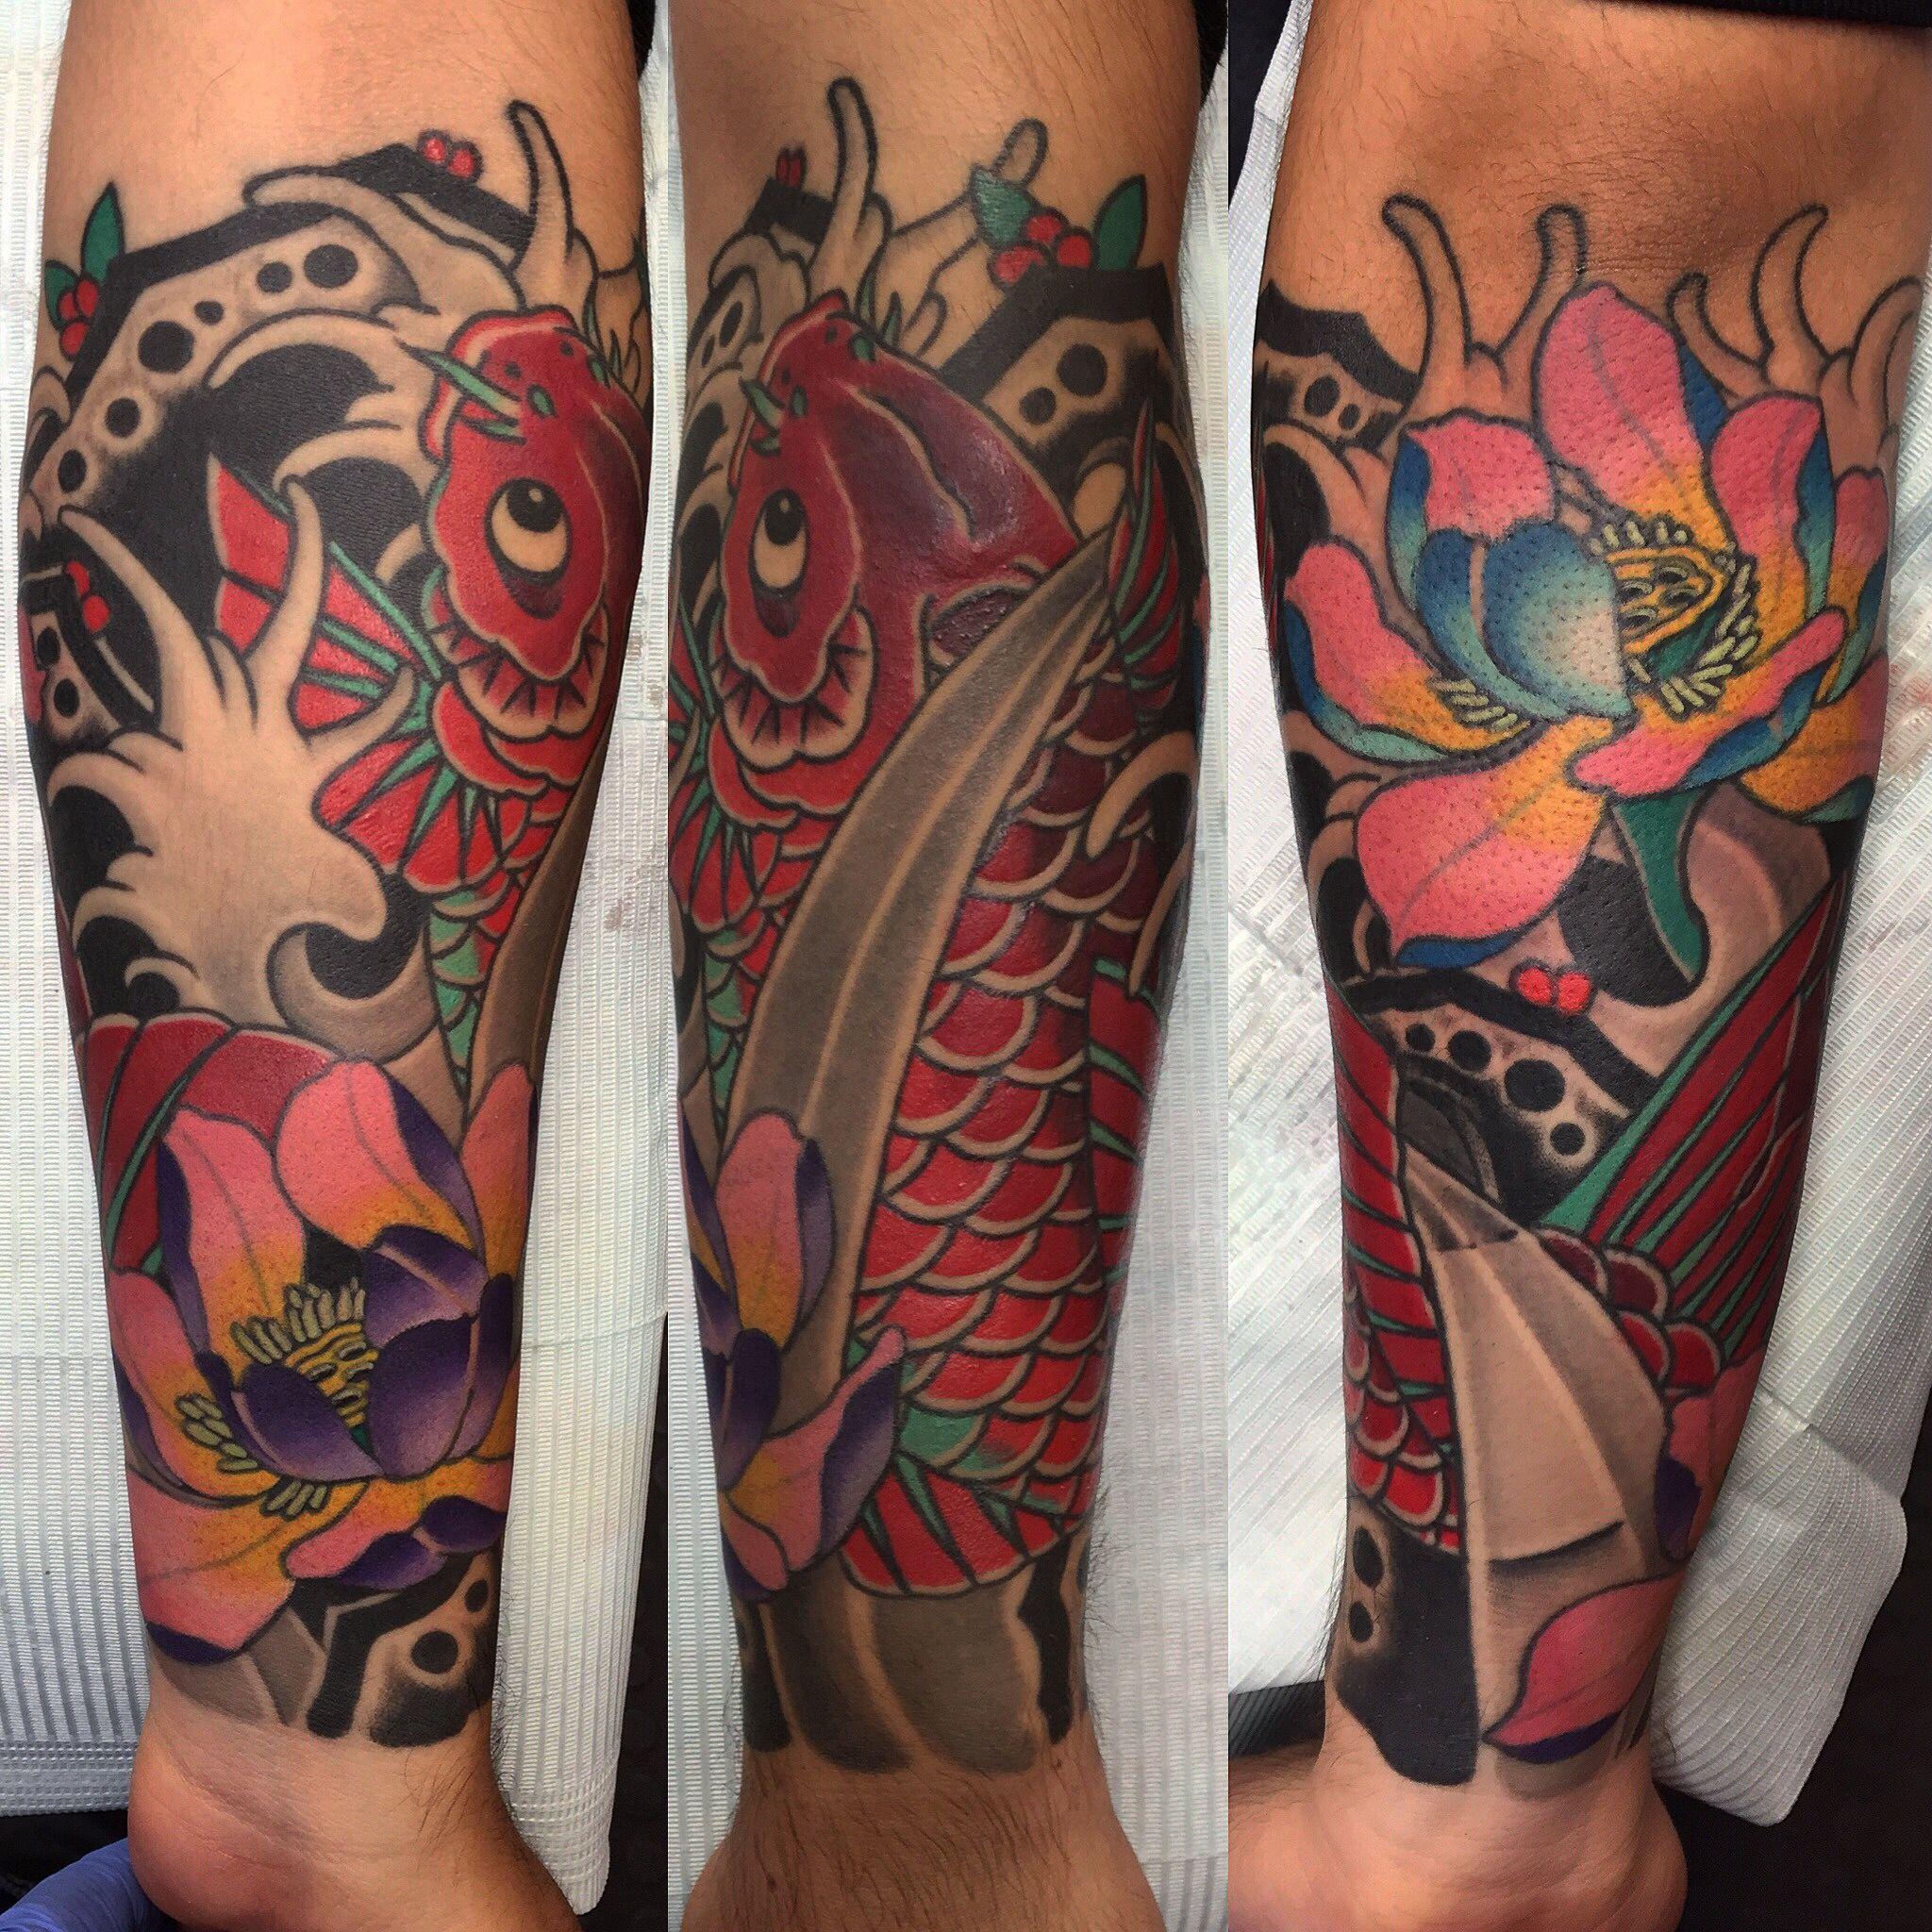 Koi fish tattoo by Jose Chalarca | Tattoos | Pinterest | Koi fish ...